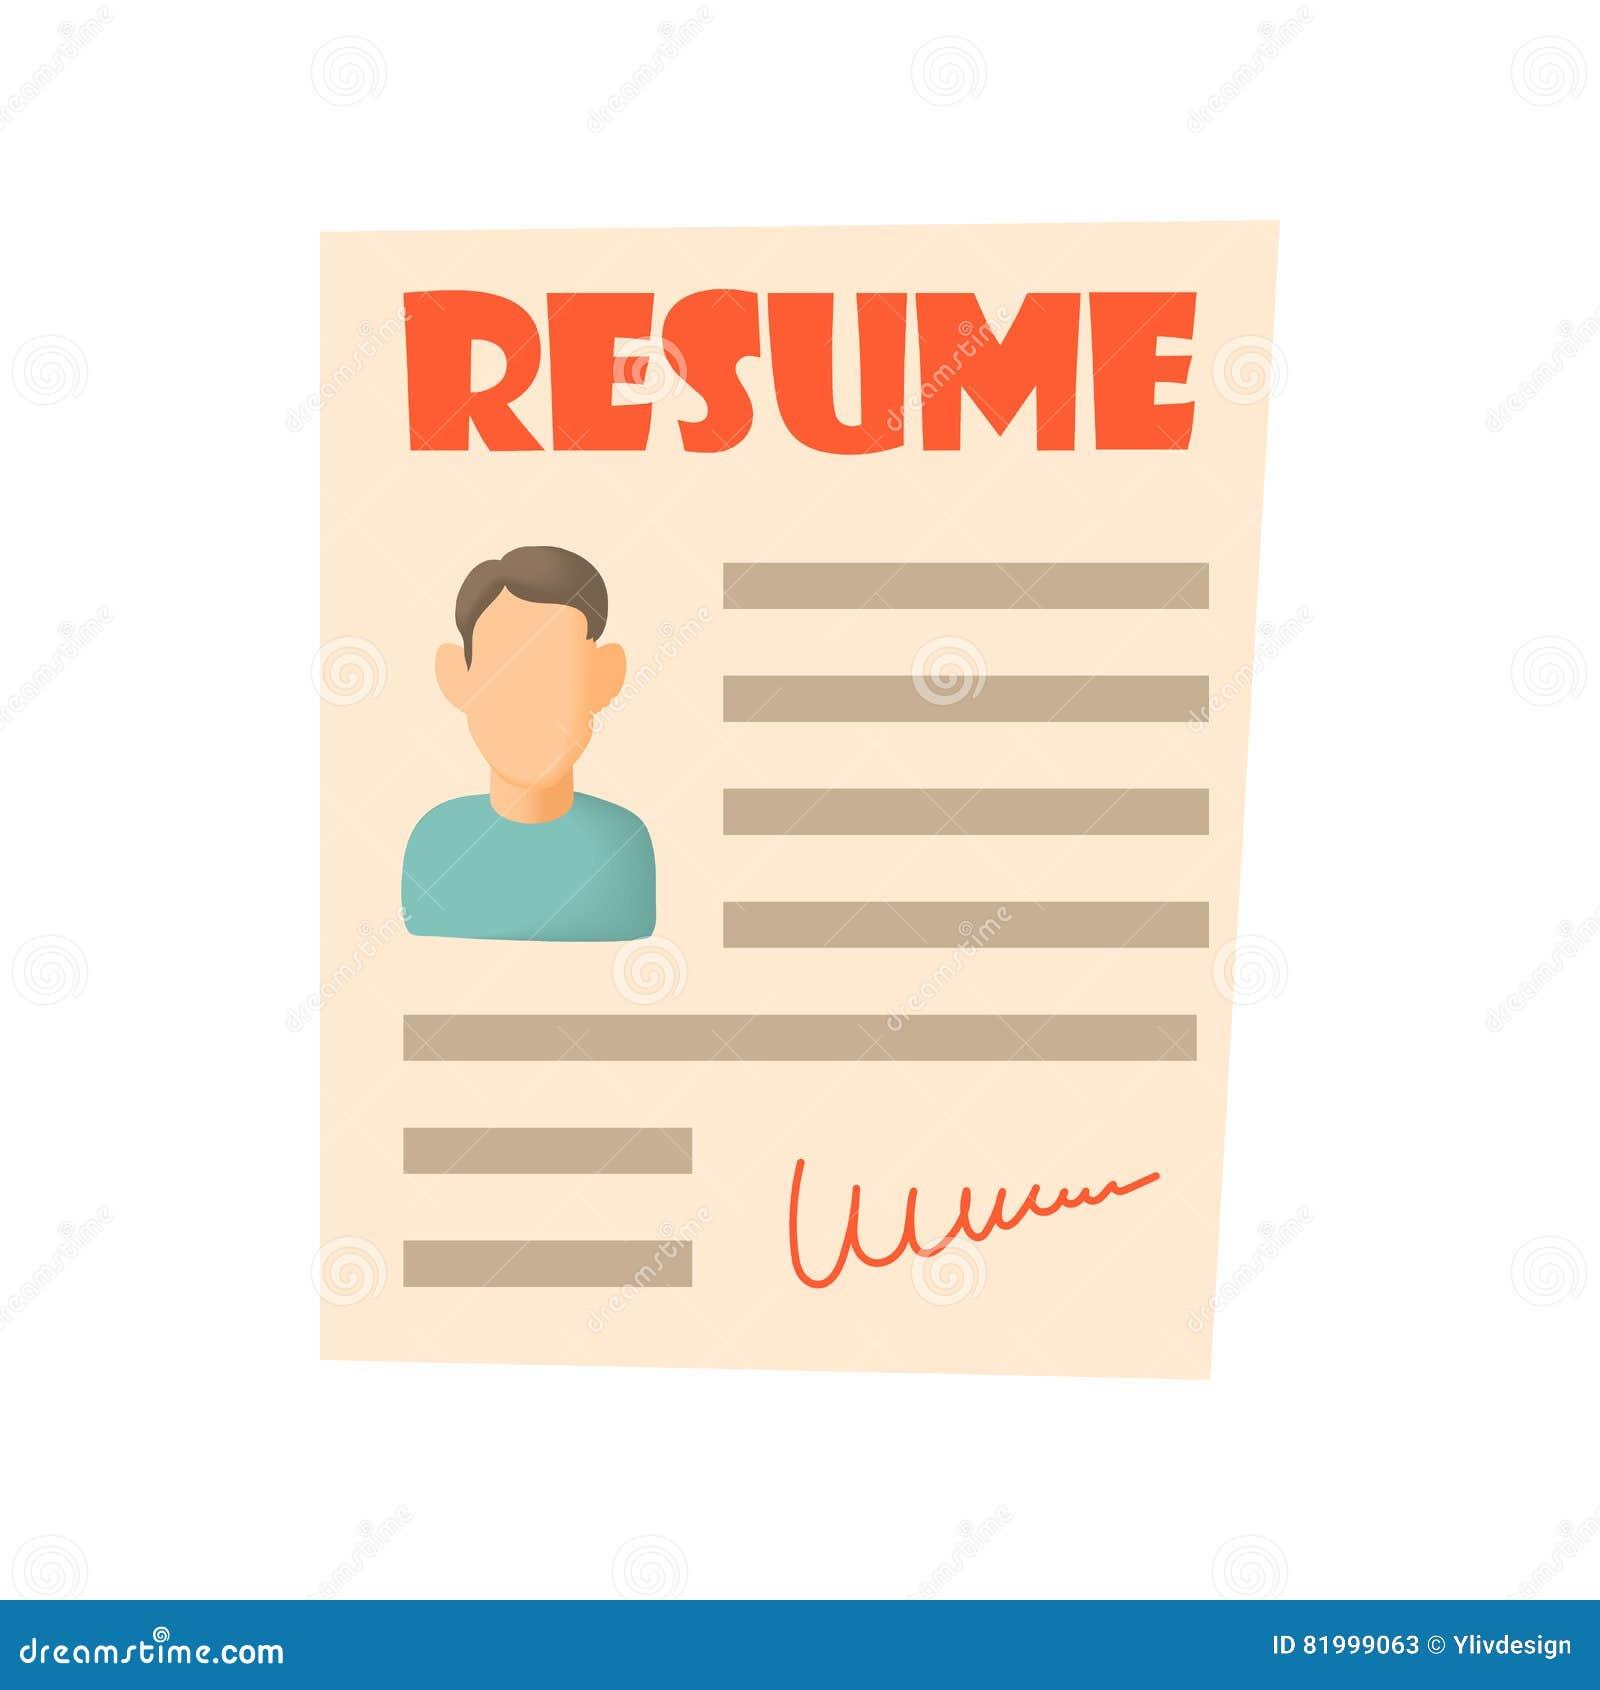 Resume Icon Cartoon Style Stock Vector Illustration Of